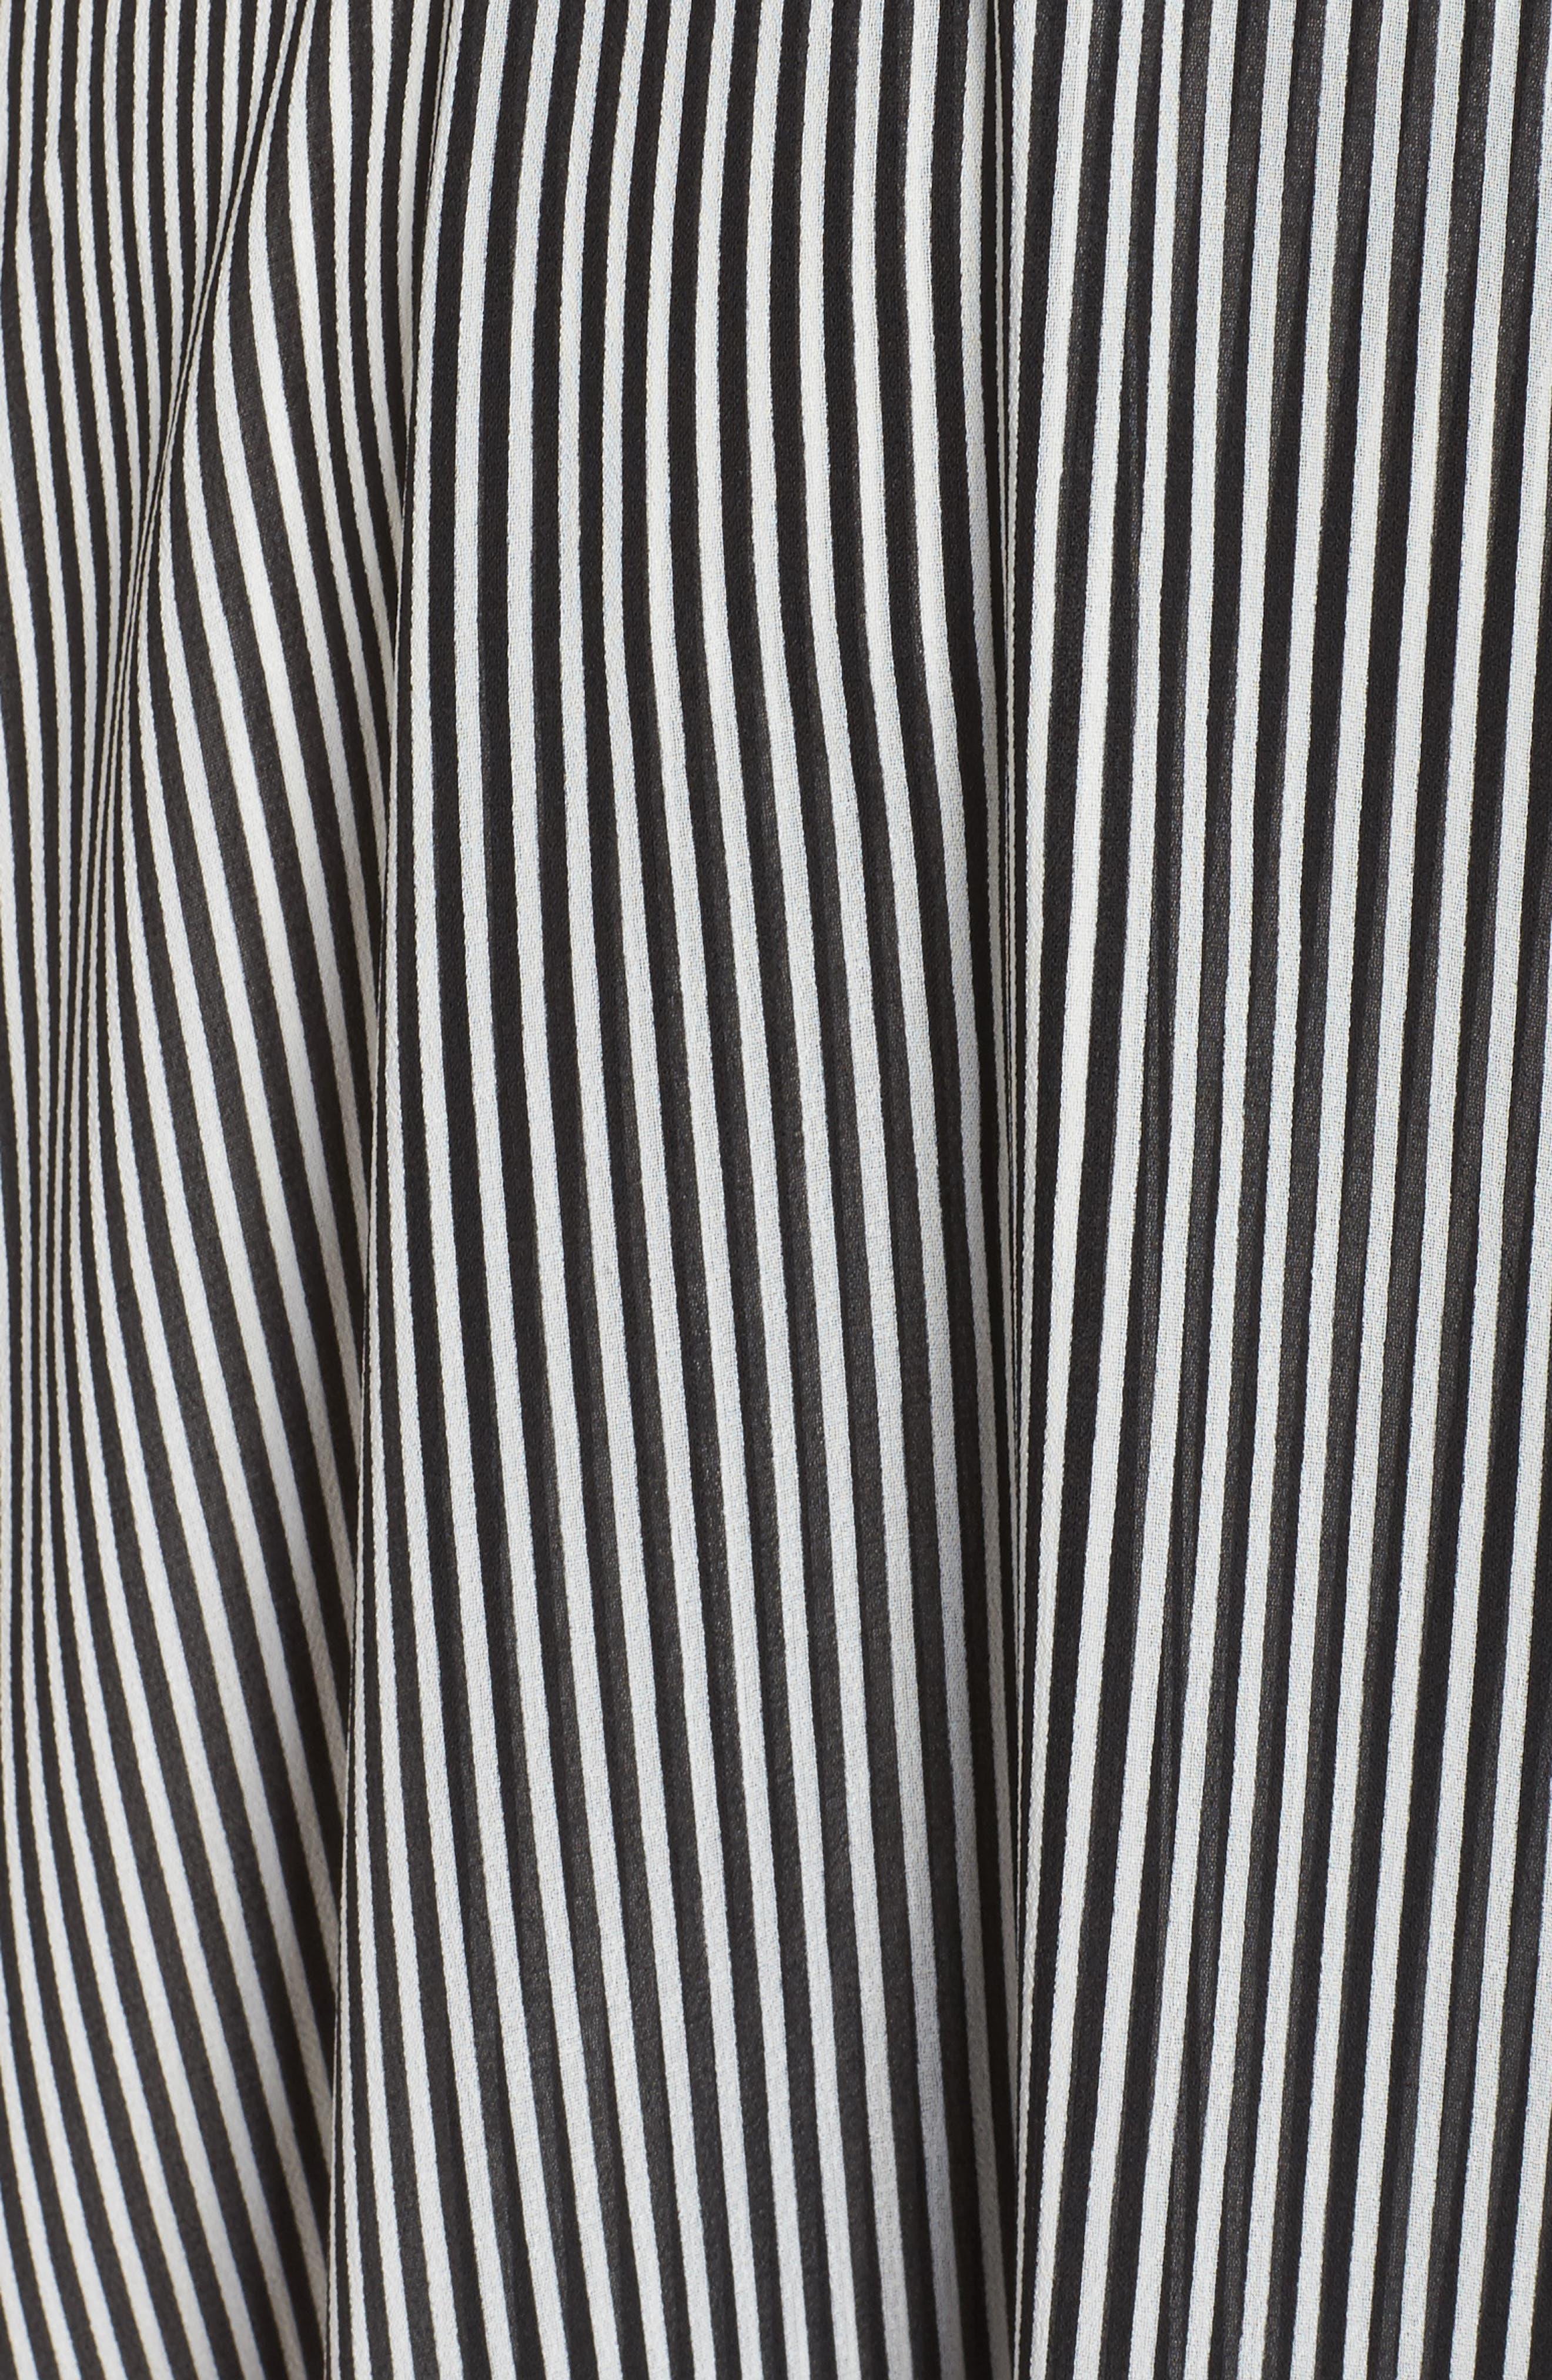 Ruffle Stripe Faux Wrap Midi Dress,                             Alternate thumbnail 4, color,                             Ivory/ Black